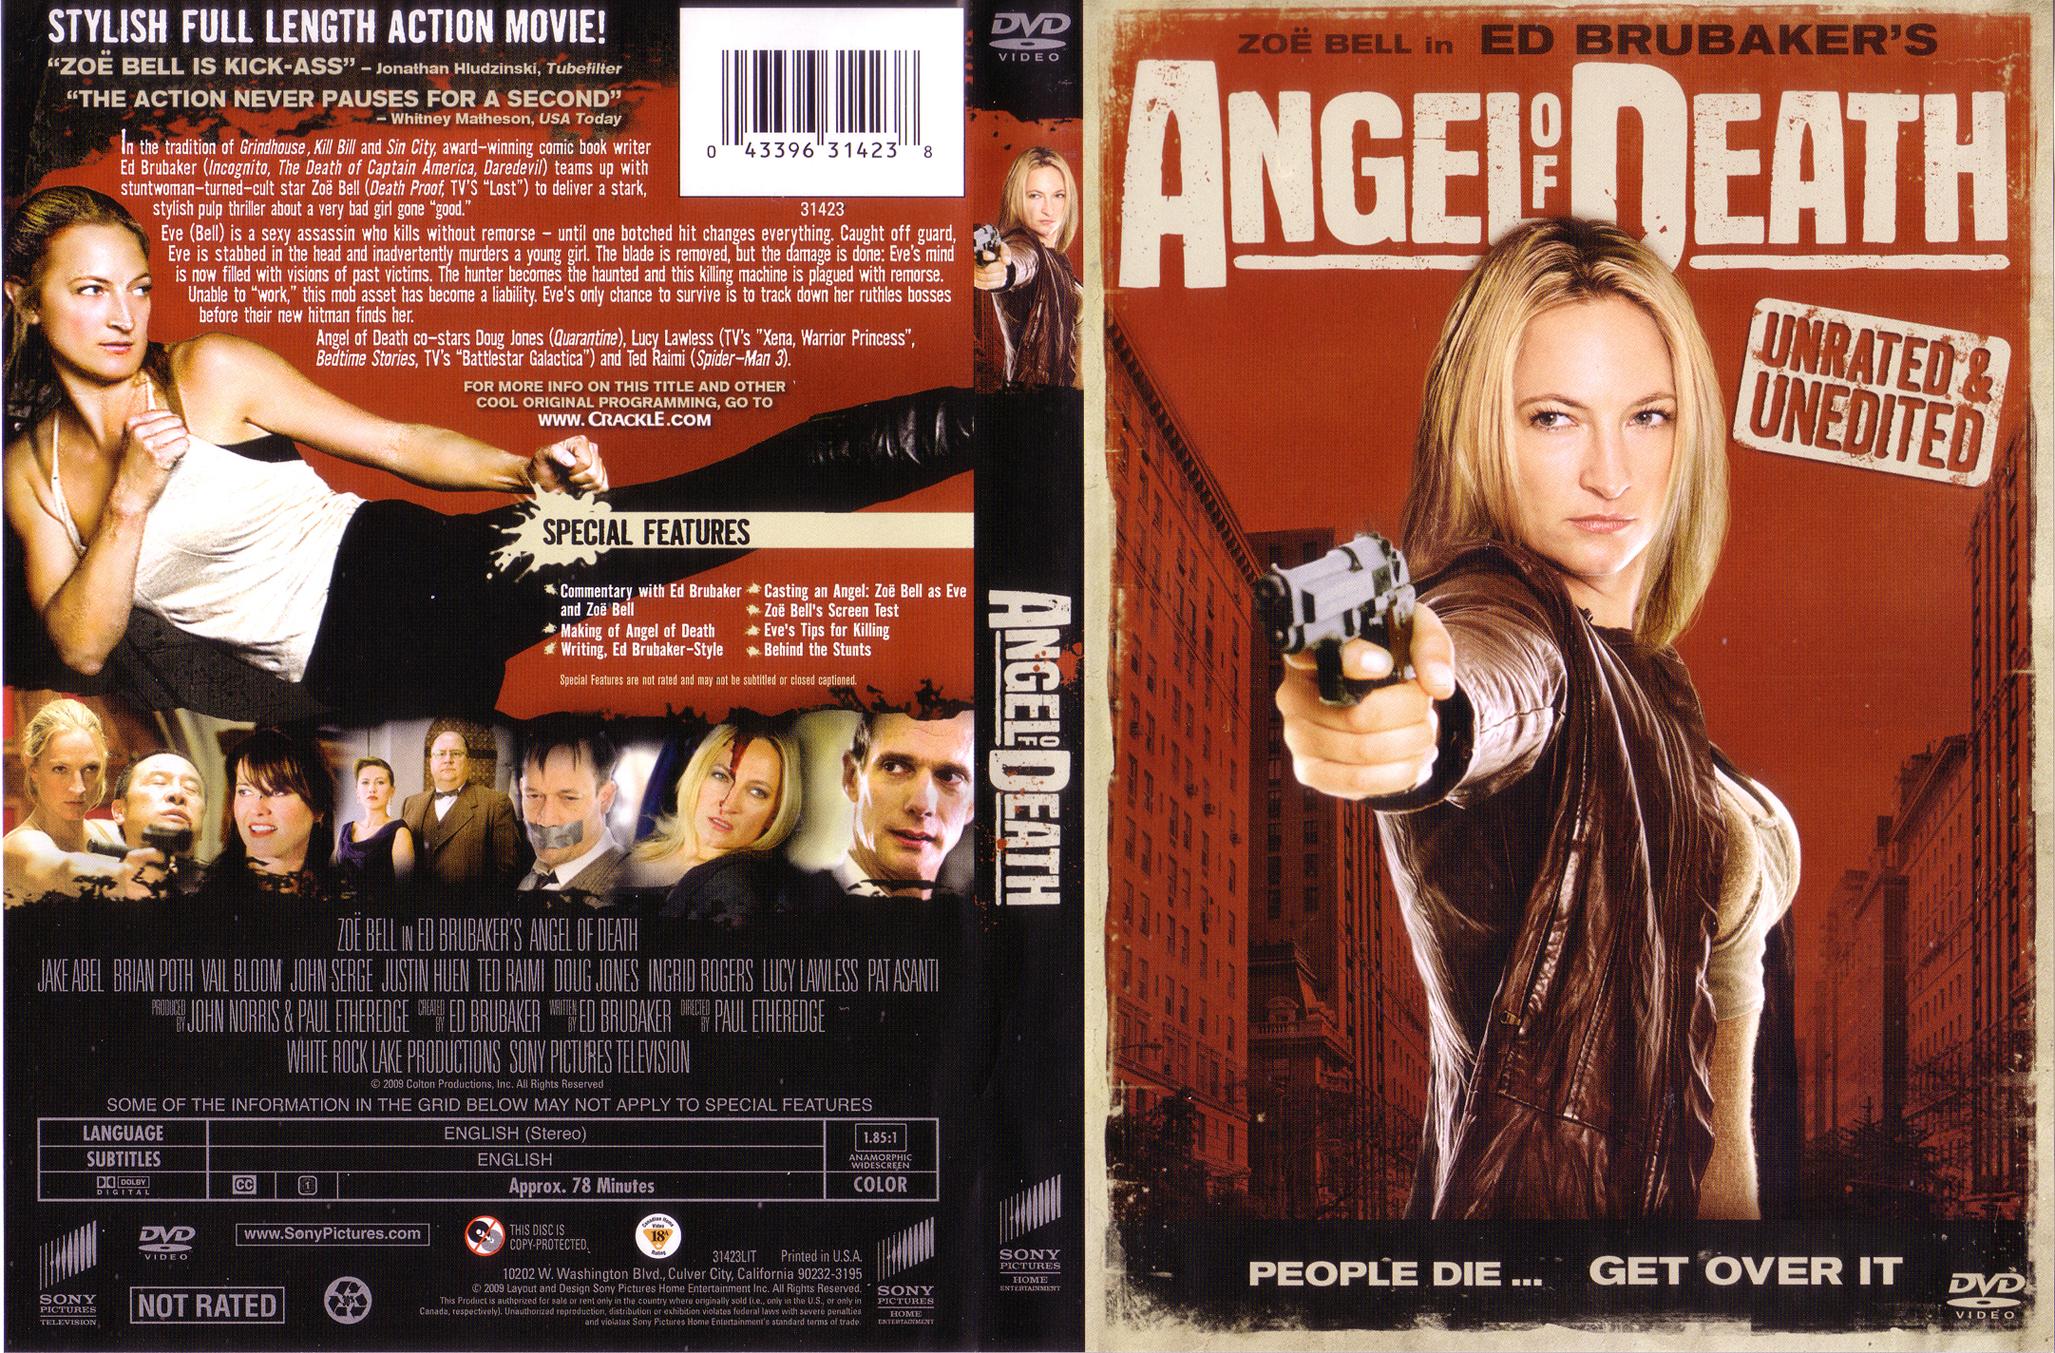 angel of death movie - photo #7